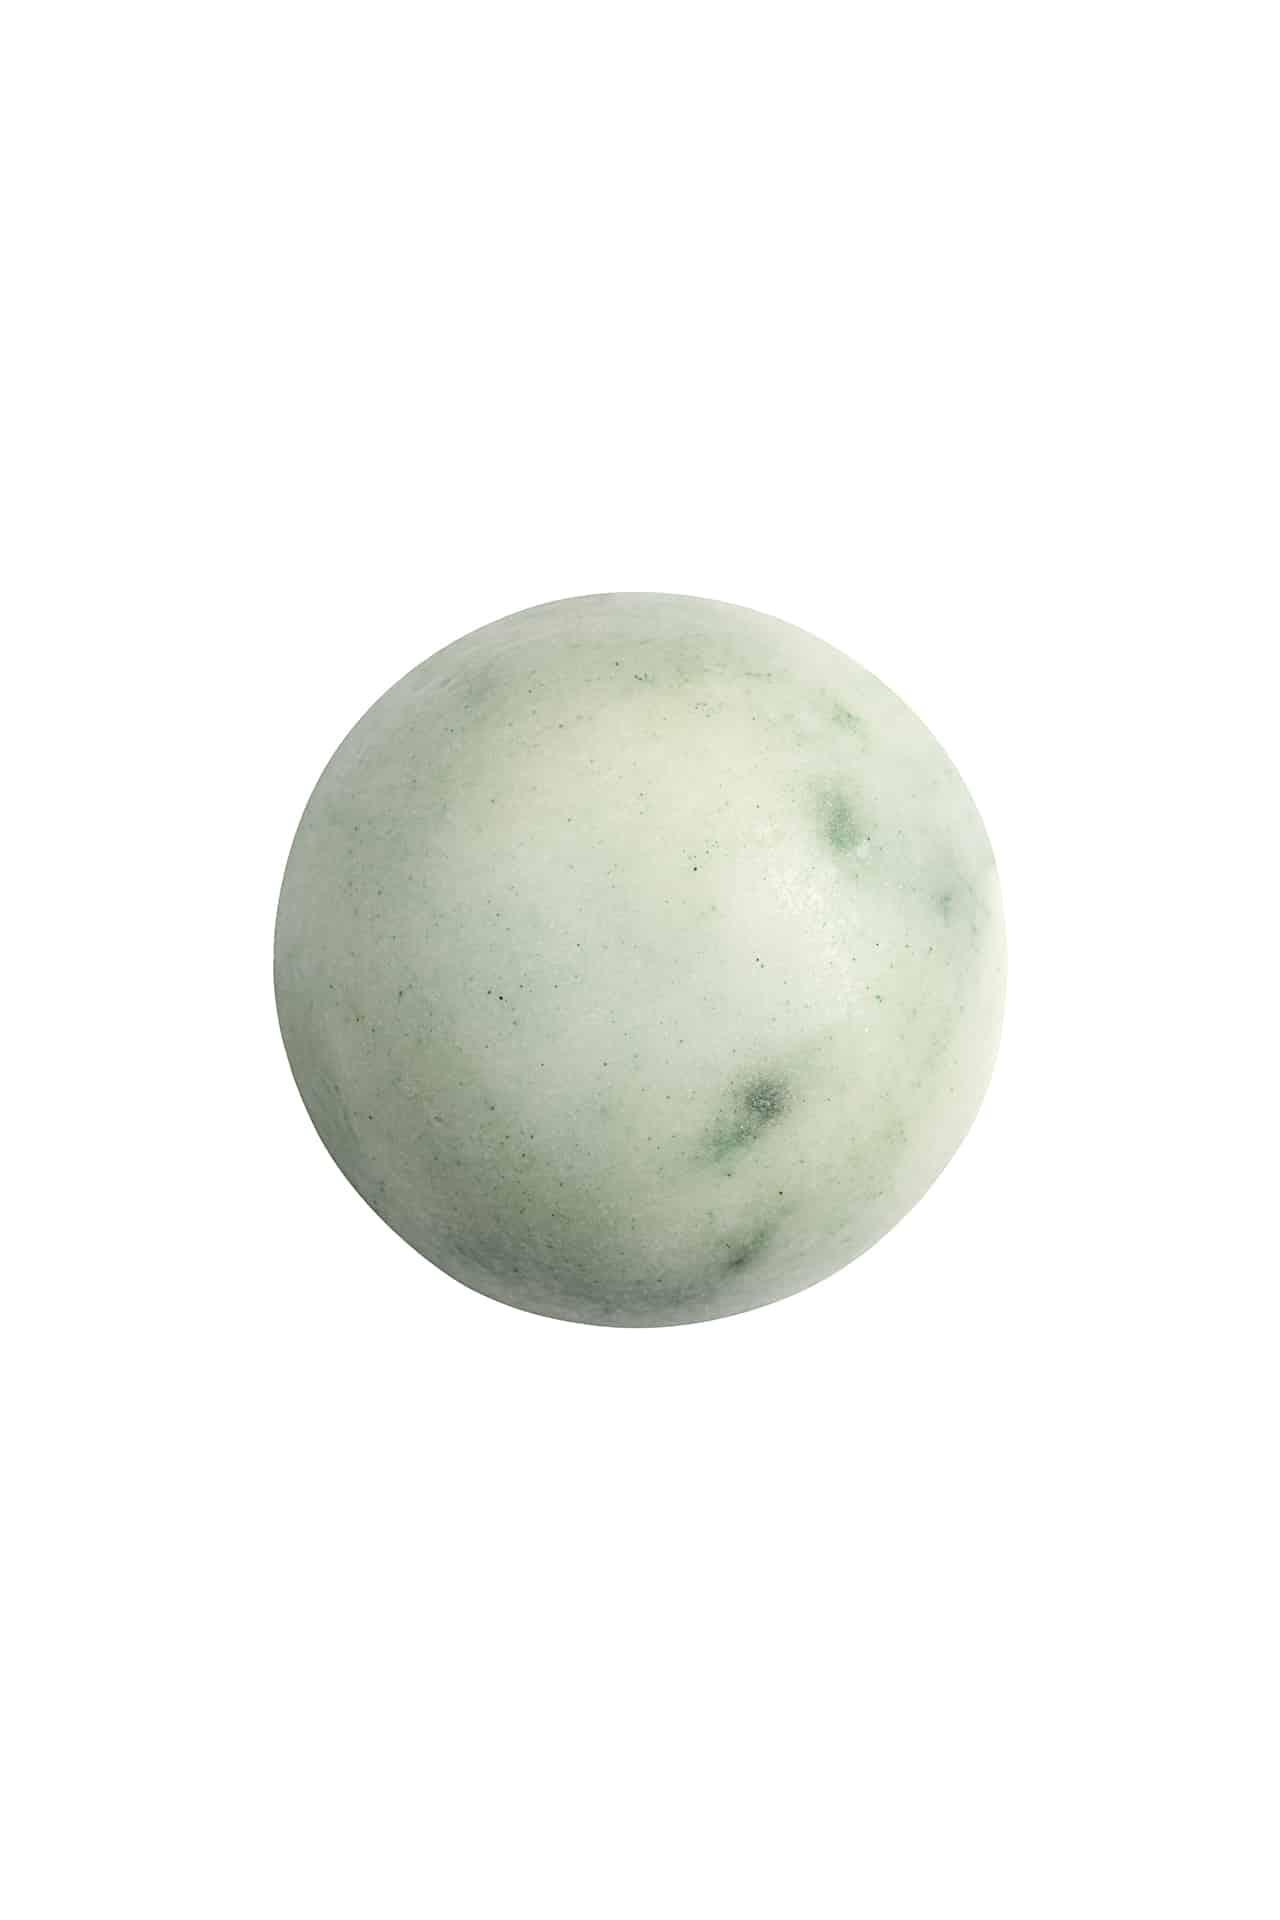 Mini Hair Crystal Bar - Spirulina Swirl (Essential) - shampoo og balsam bar